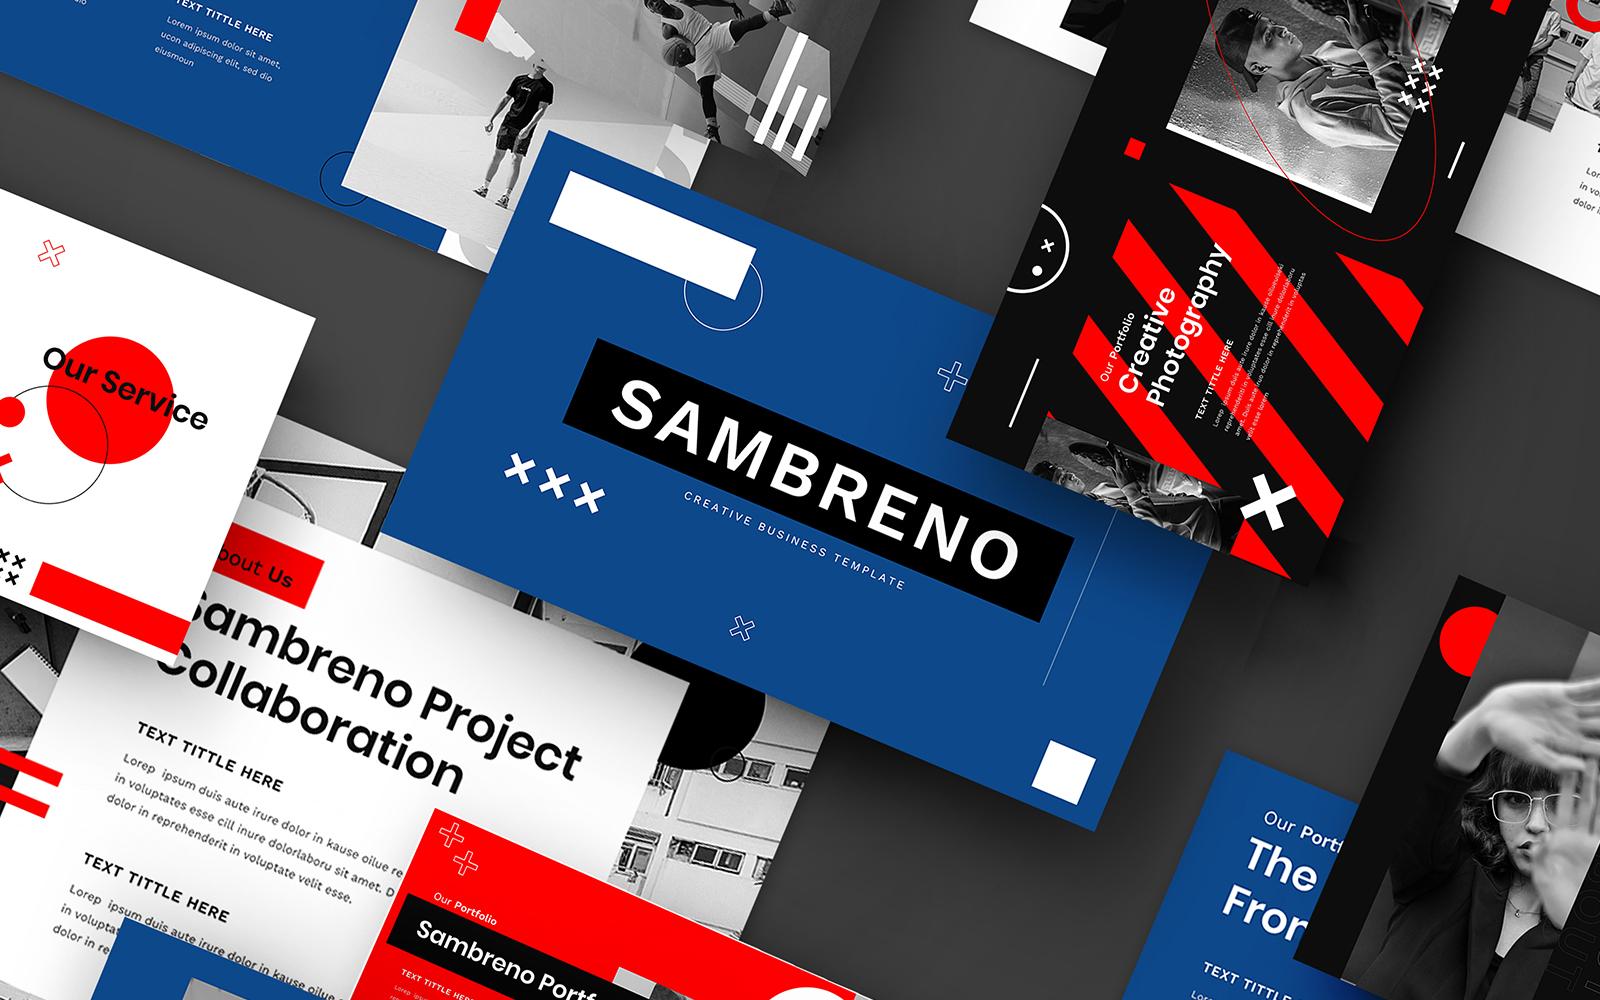 Google Slides Sambreno – Creative Business Template #110284